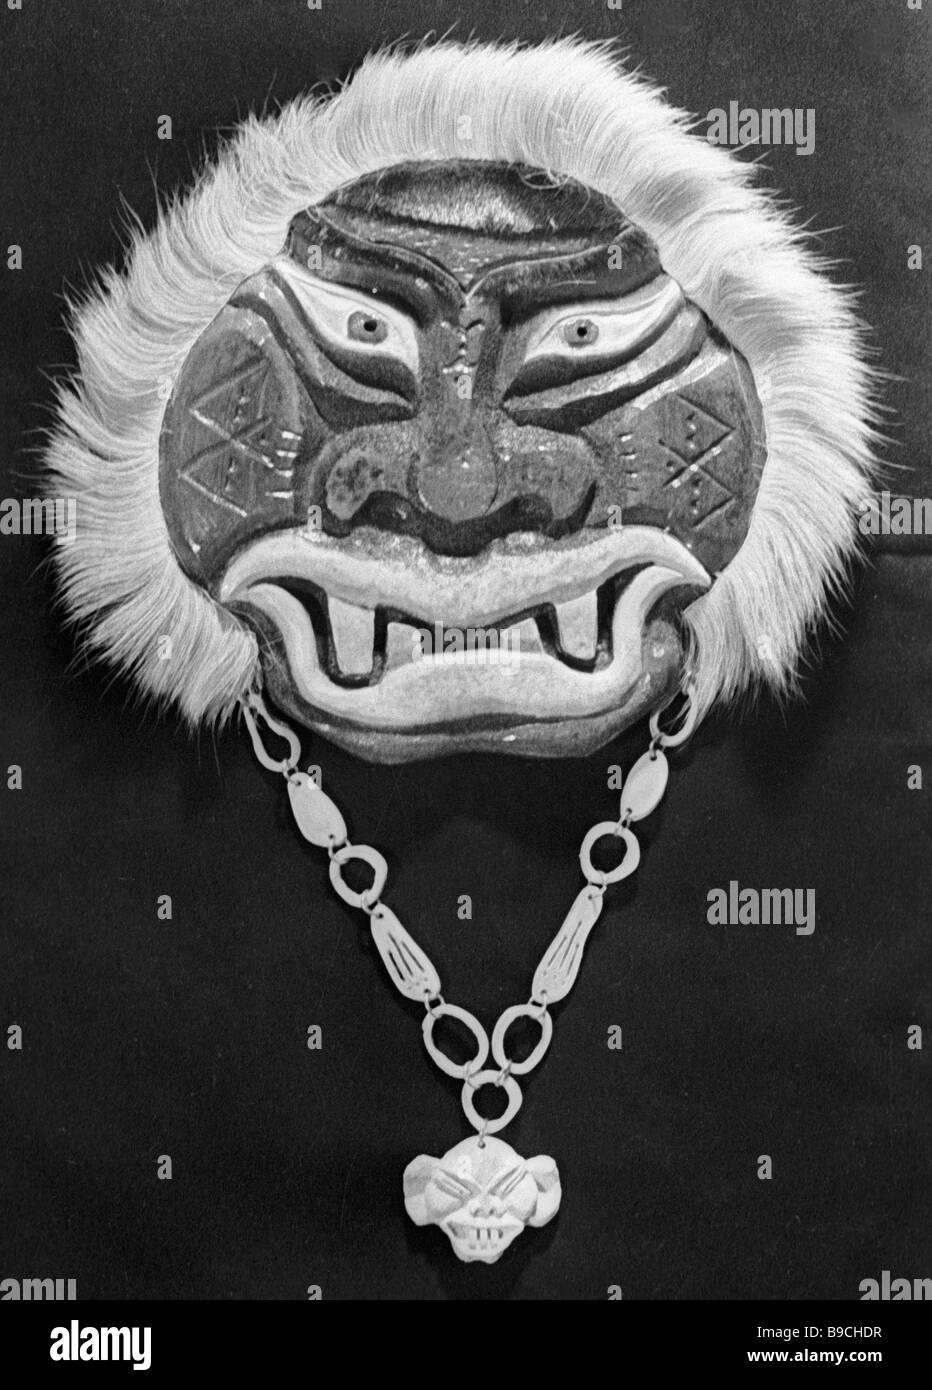 The memento shaman fur mask made at the Providence art workshop - Stock Image